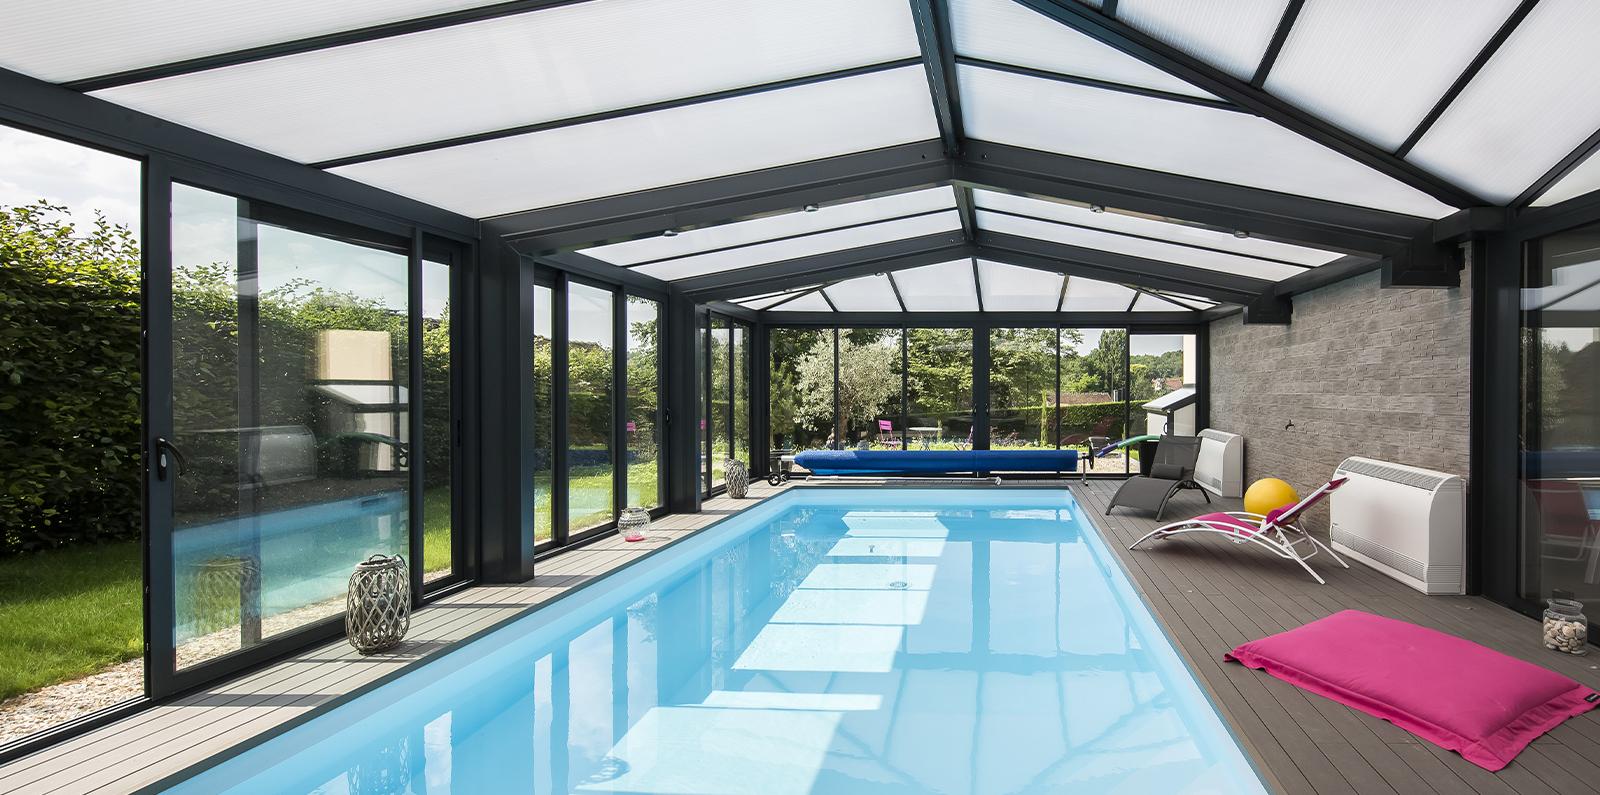 Extension Maison Piscine Couverte couverture de piscine - véranda pour piscine - soko